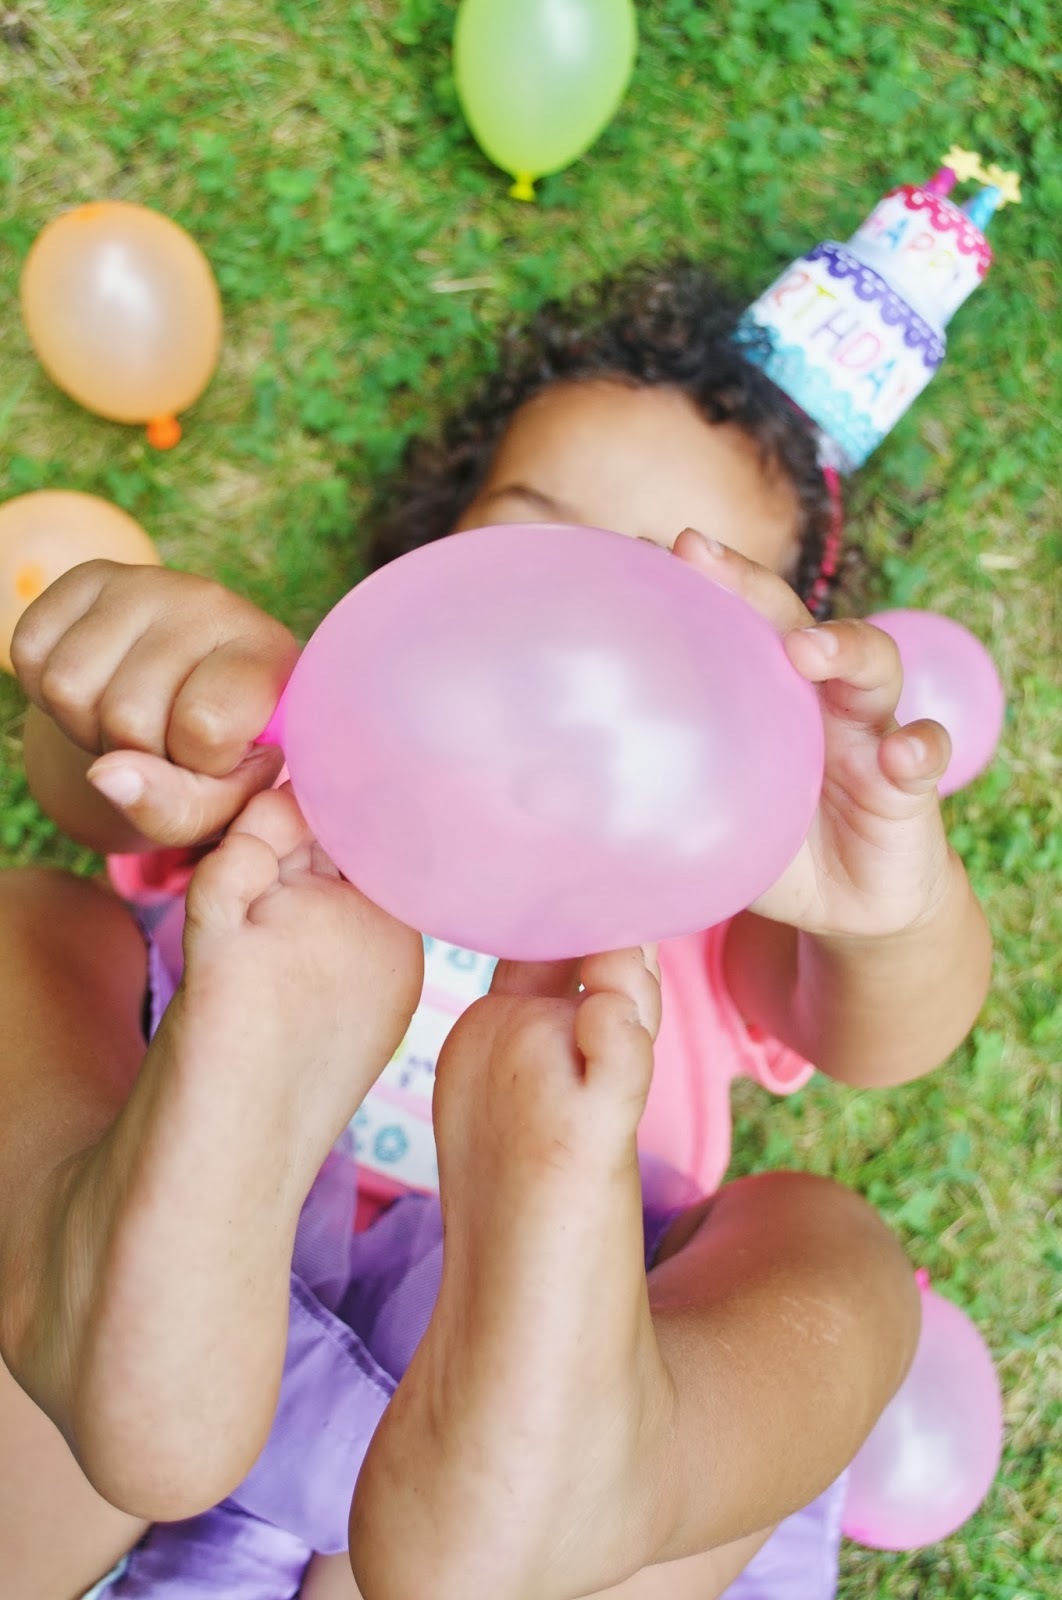 4 Fun Ways To Use Dollar Store Water Balloons